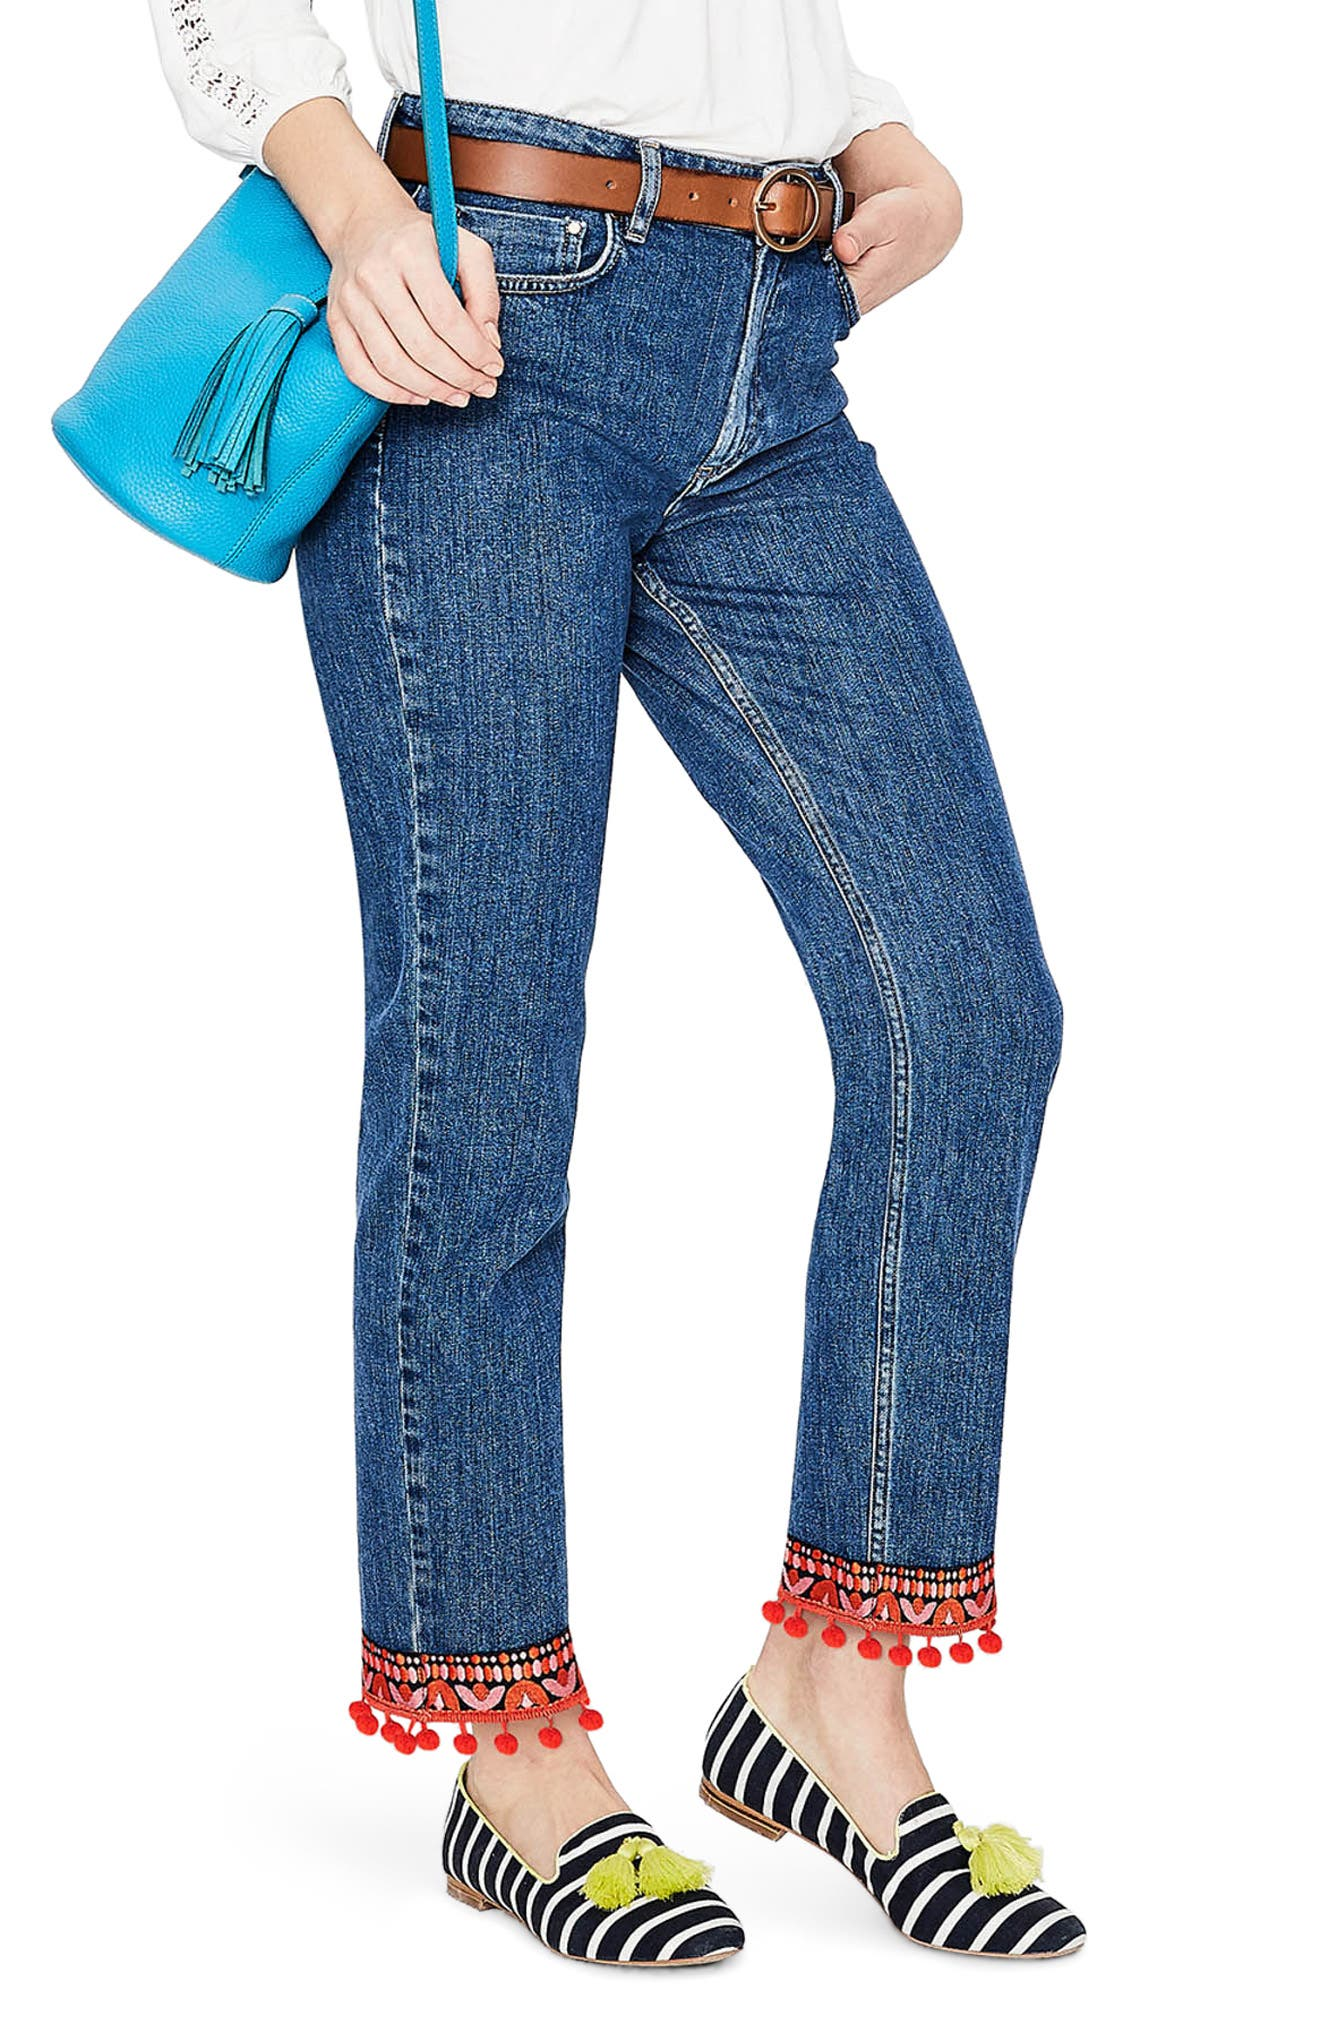 BODEN,                             Cambridge Embellished Ankle Skimmer Jeans,                             Main thumbnail 1, color,                             469